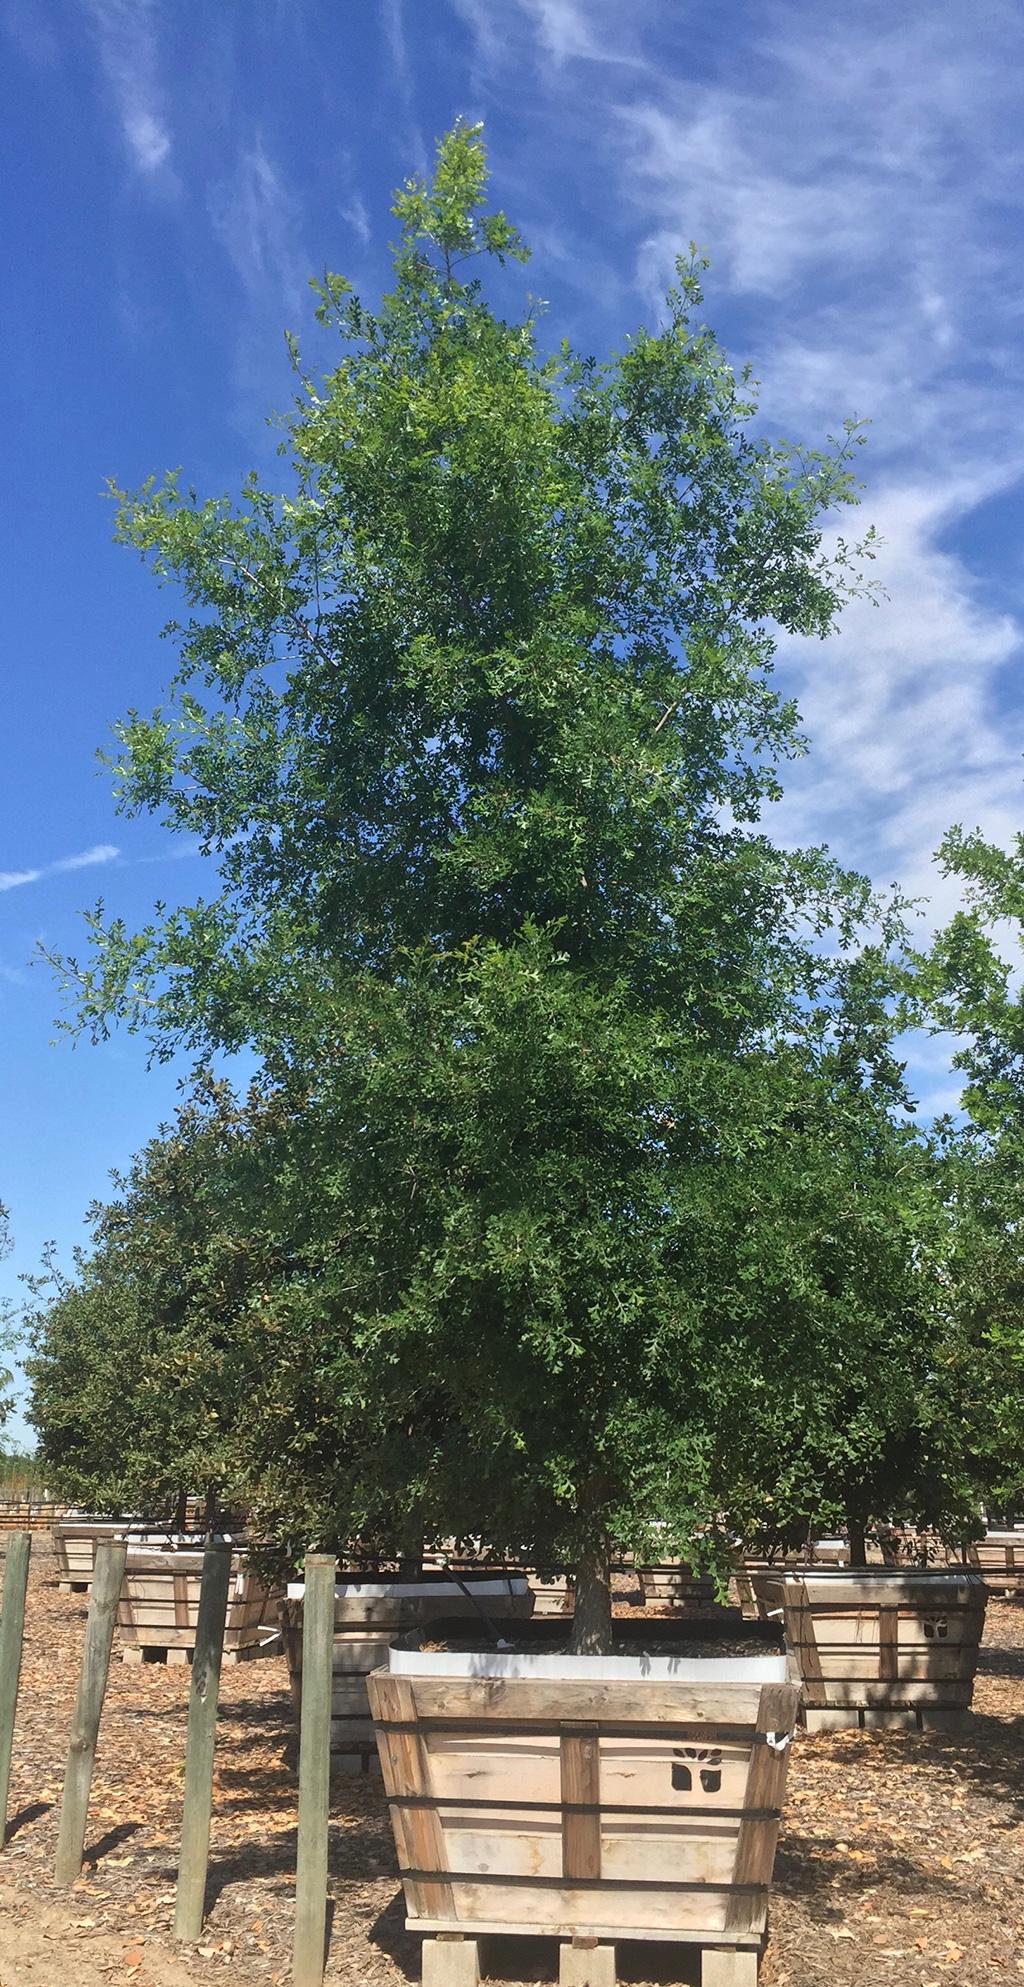 Hybrid Oak - Bur Oak x English Oak x Valley Oak